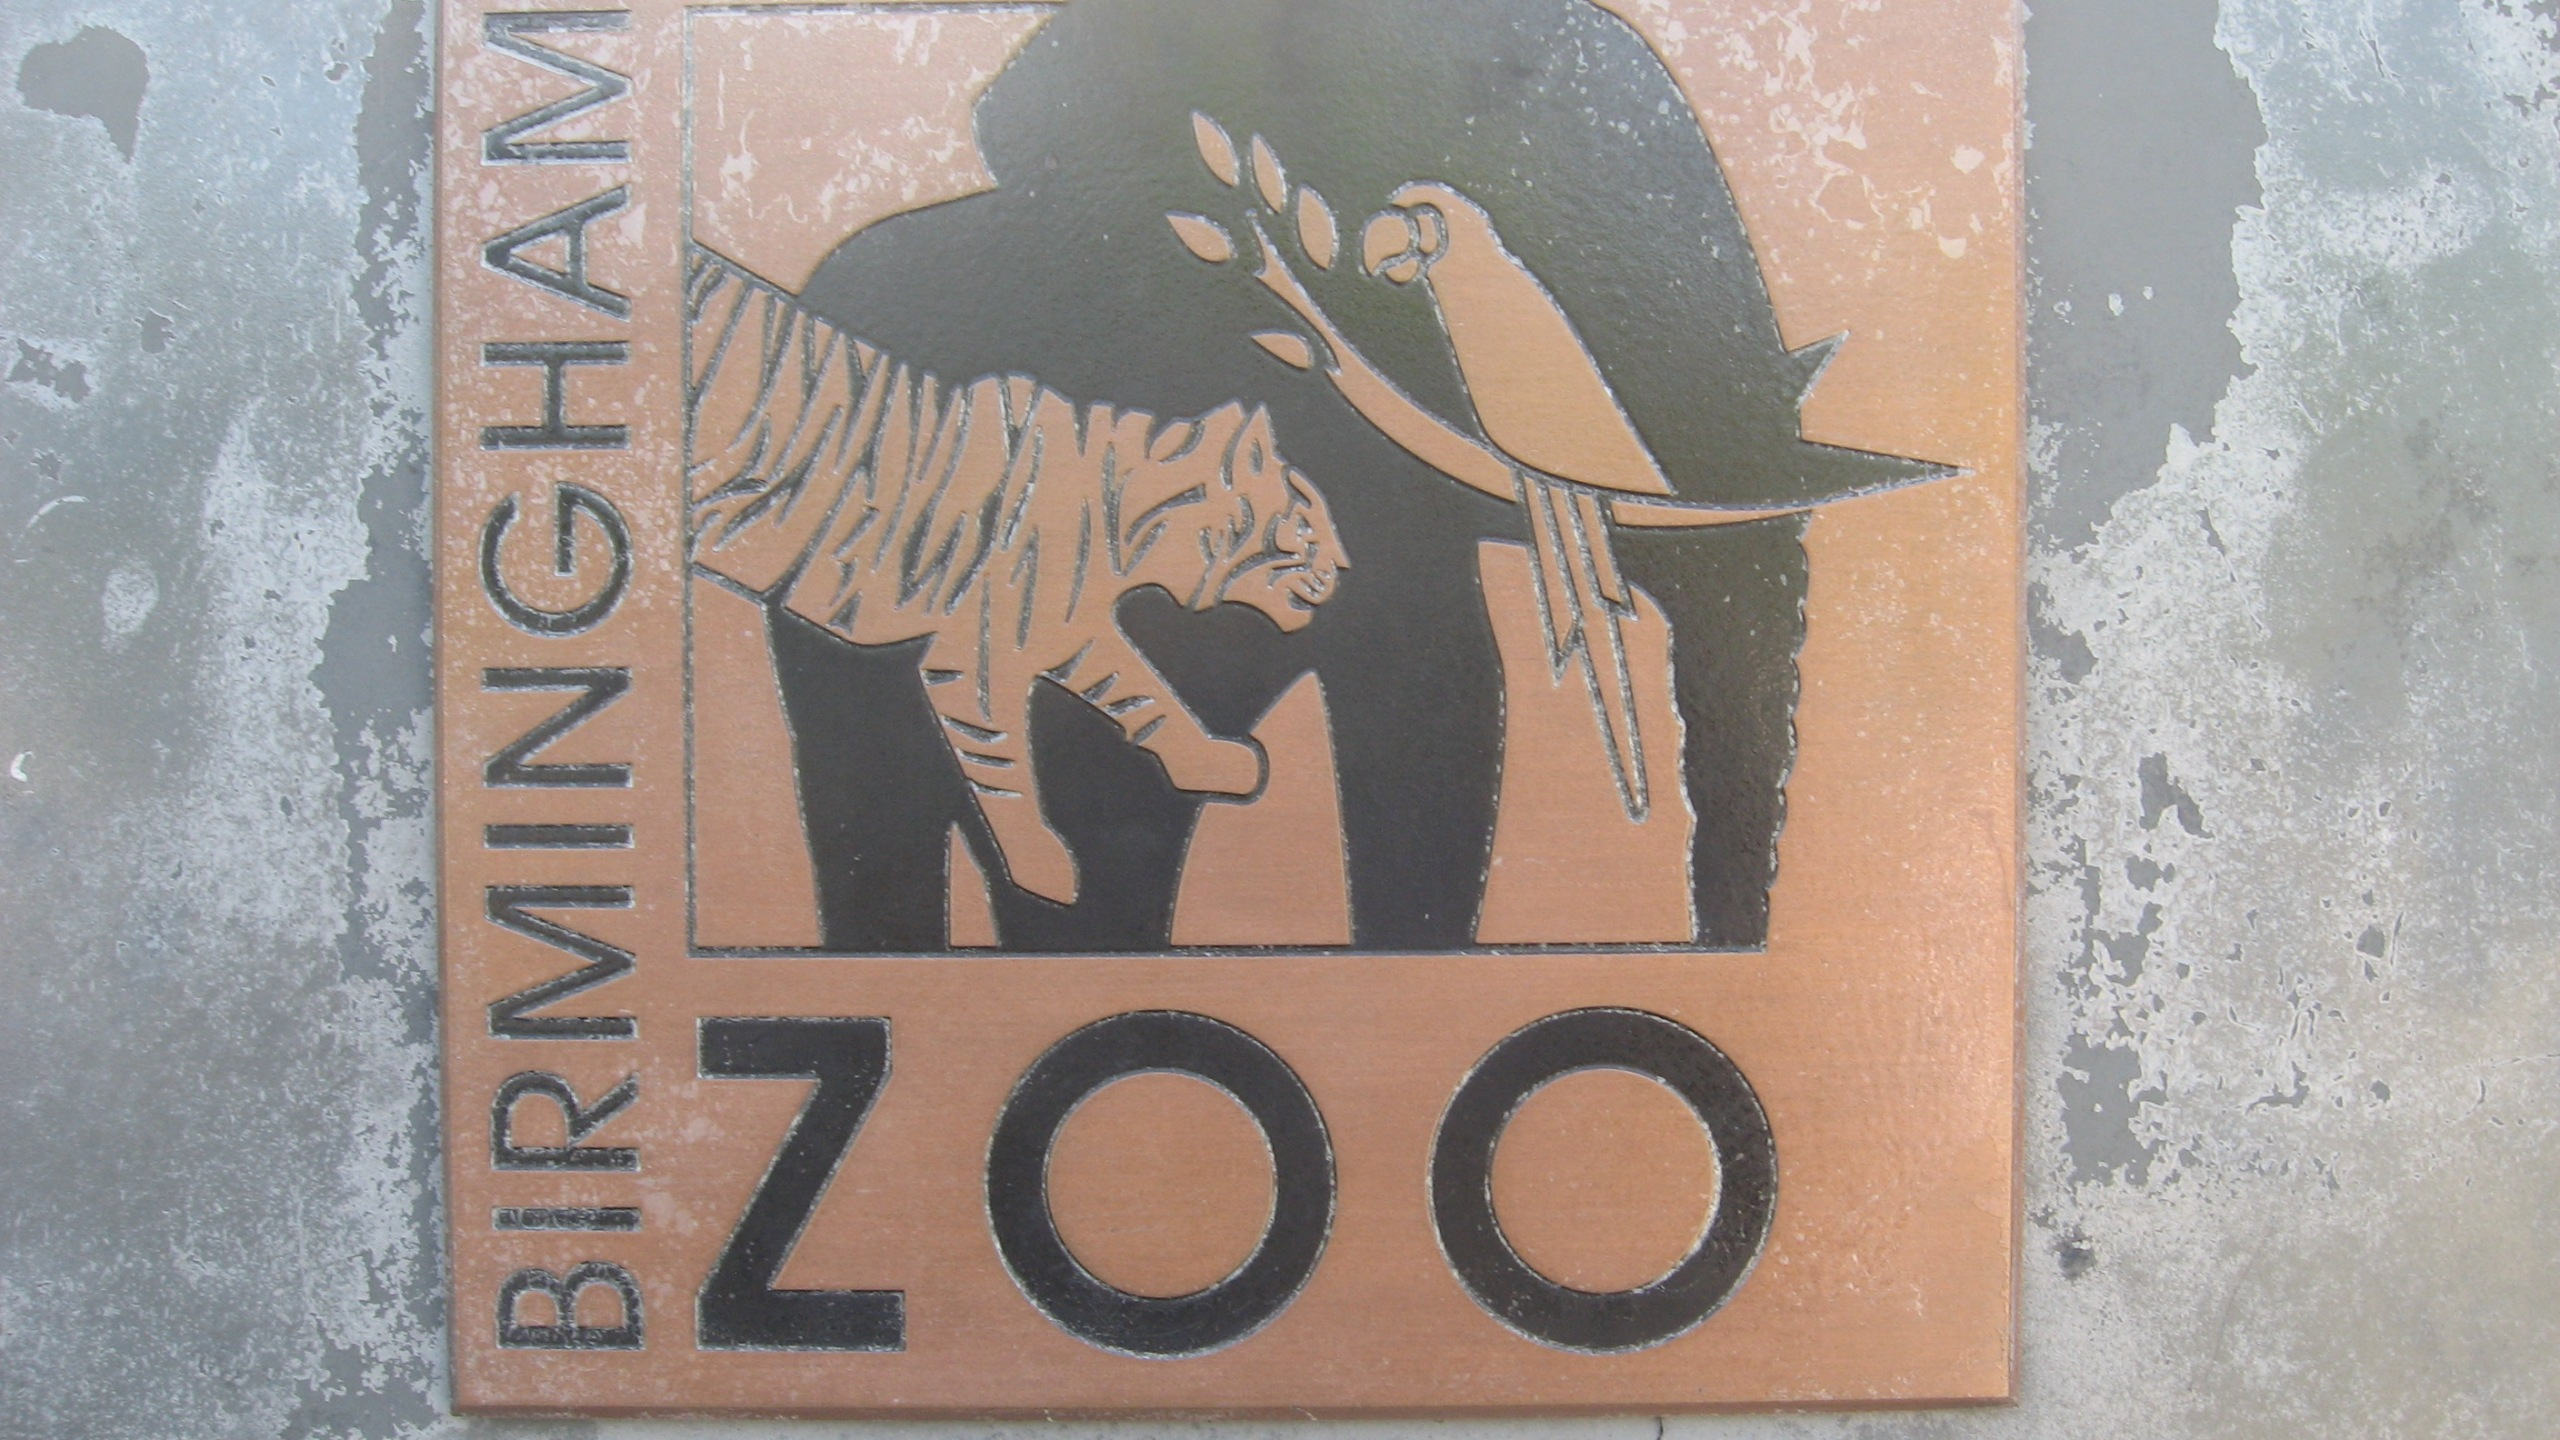 Birmingham_Zoo_Sign_121650